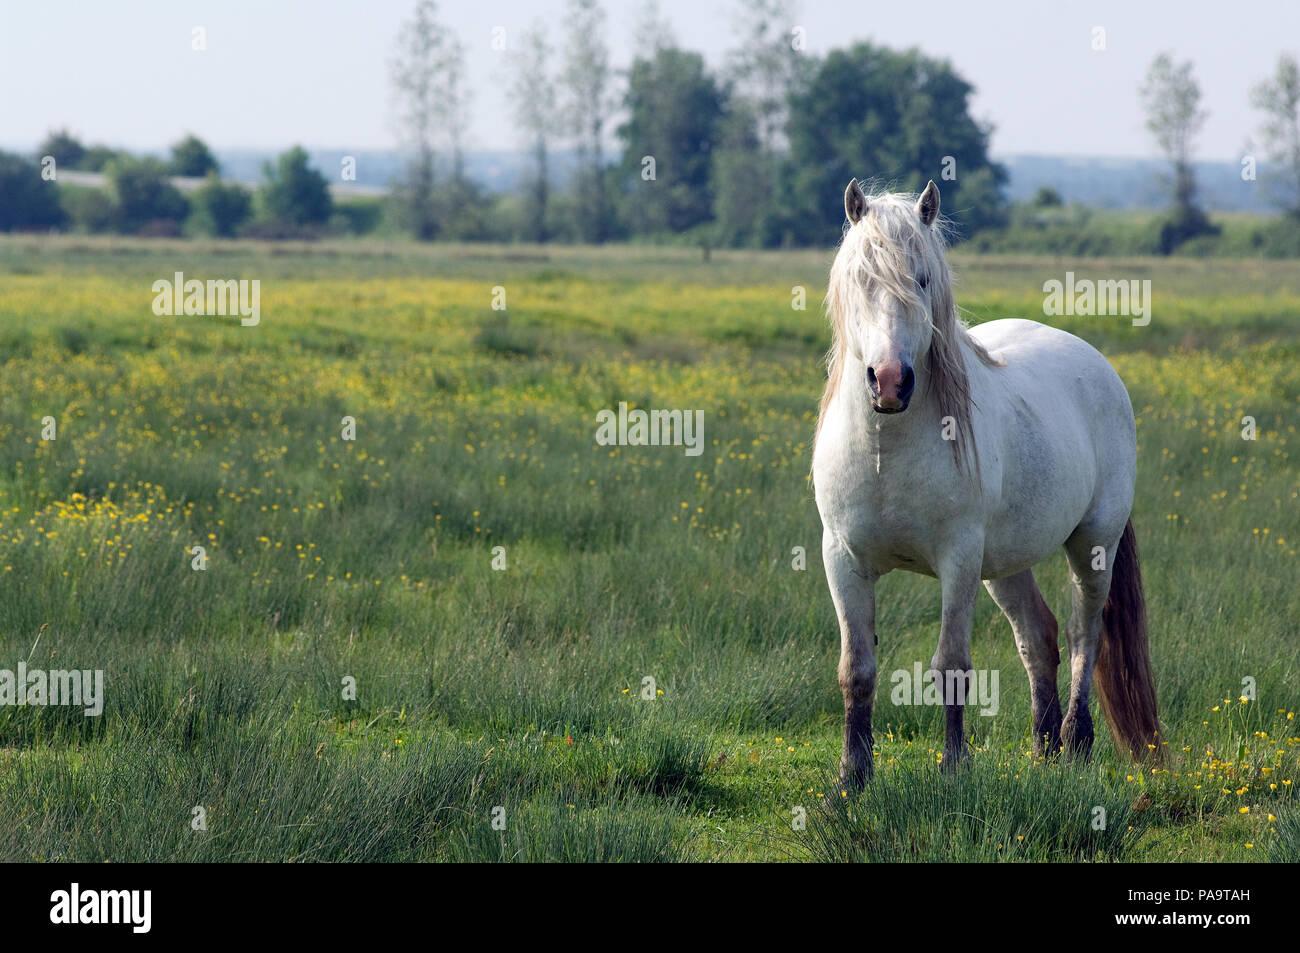 PRE (Pure Race Espagnole) - Spanish breed (Equus caballus) - Stock Image